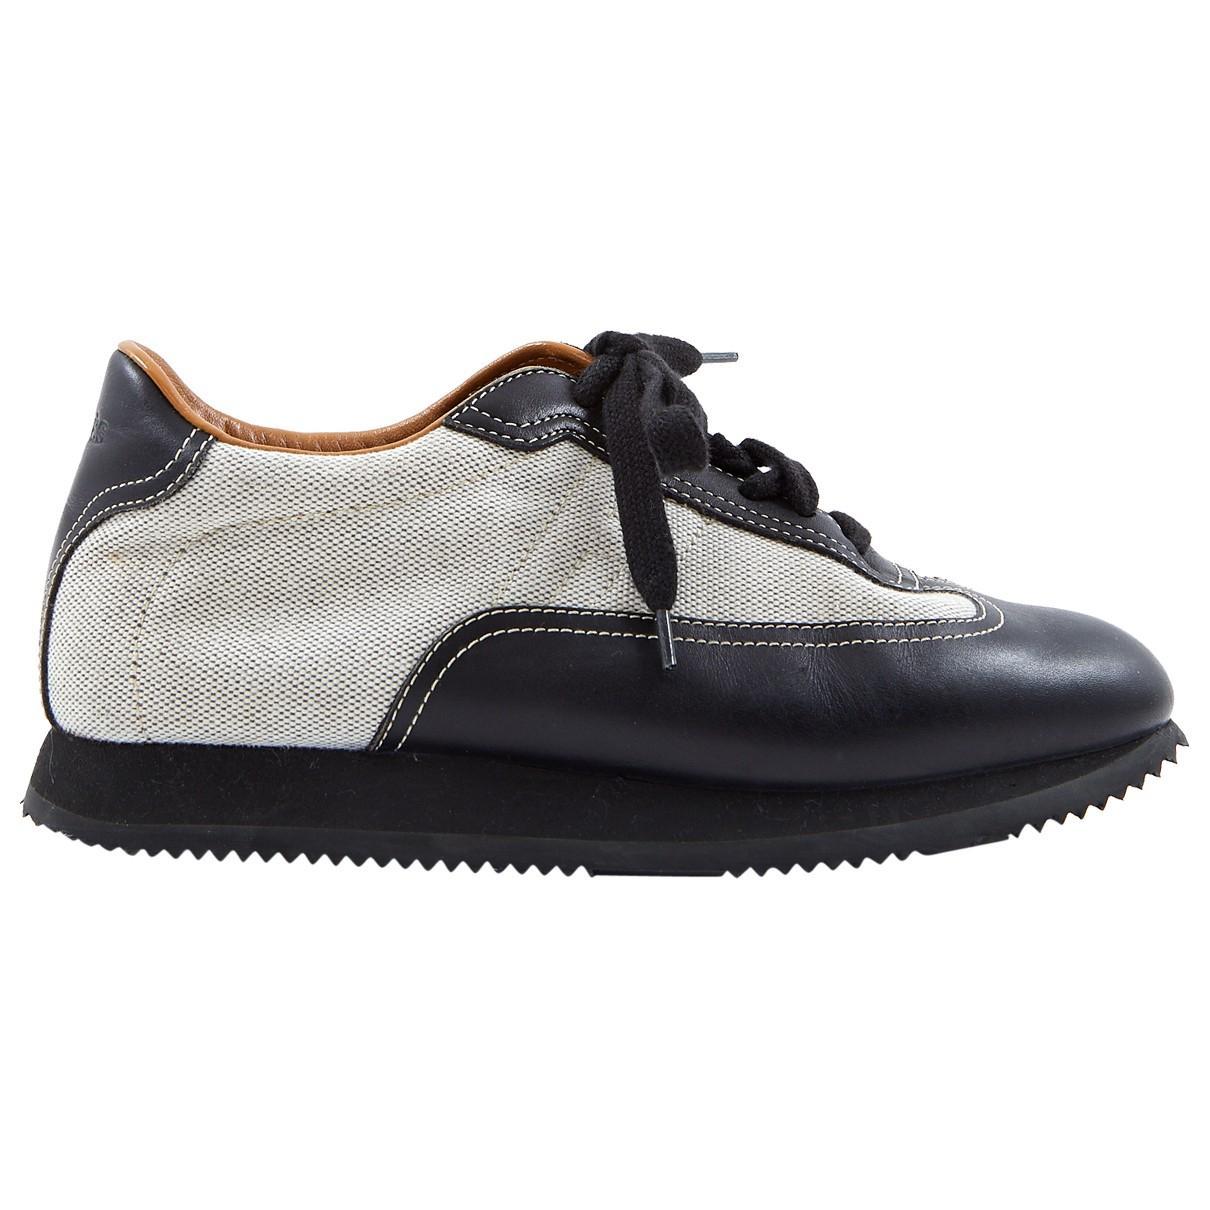 31cbfc1867bc Lyst - Hermès Multicolour Cloth Trainers in Black